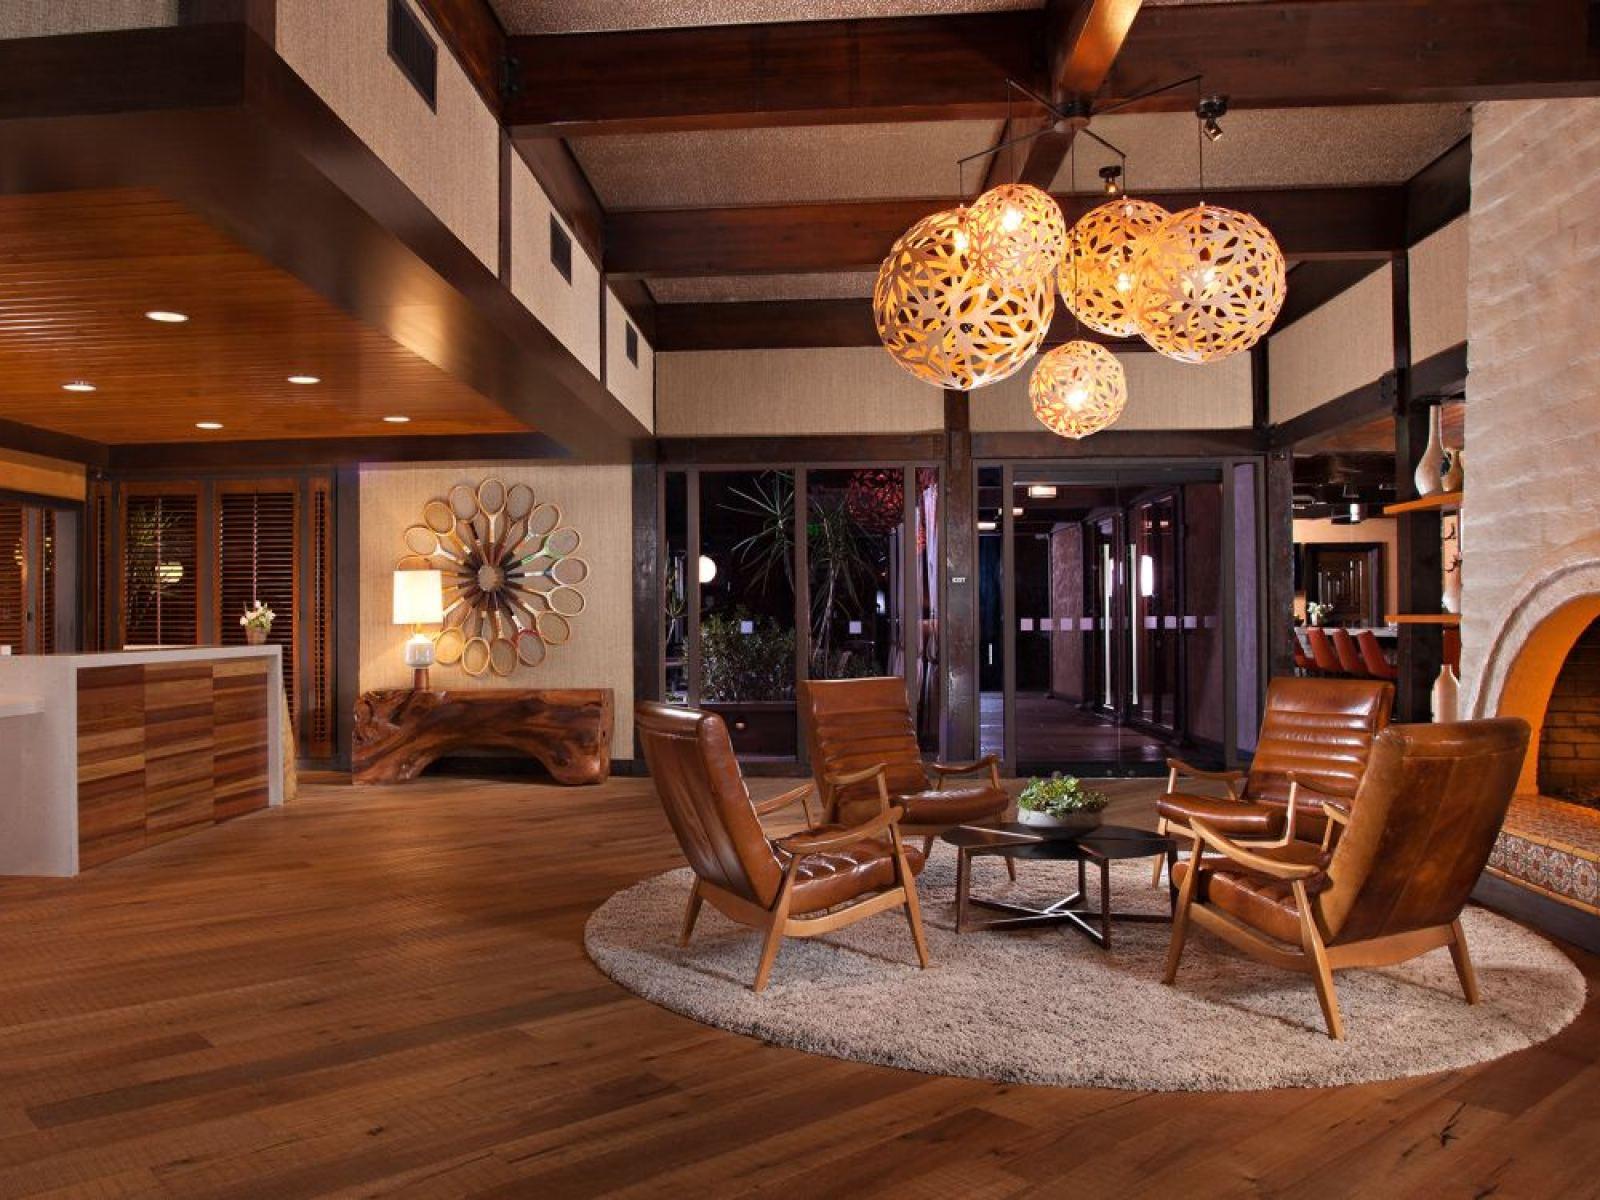 The Garland hotel lobby